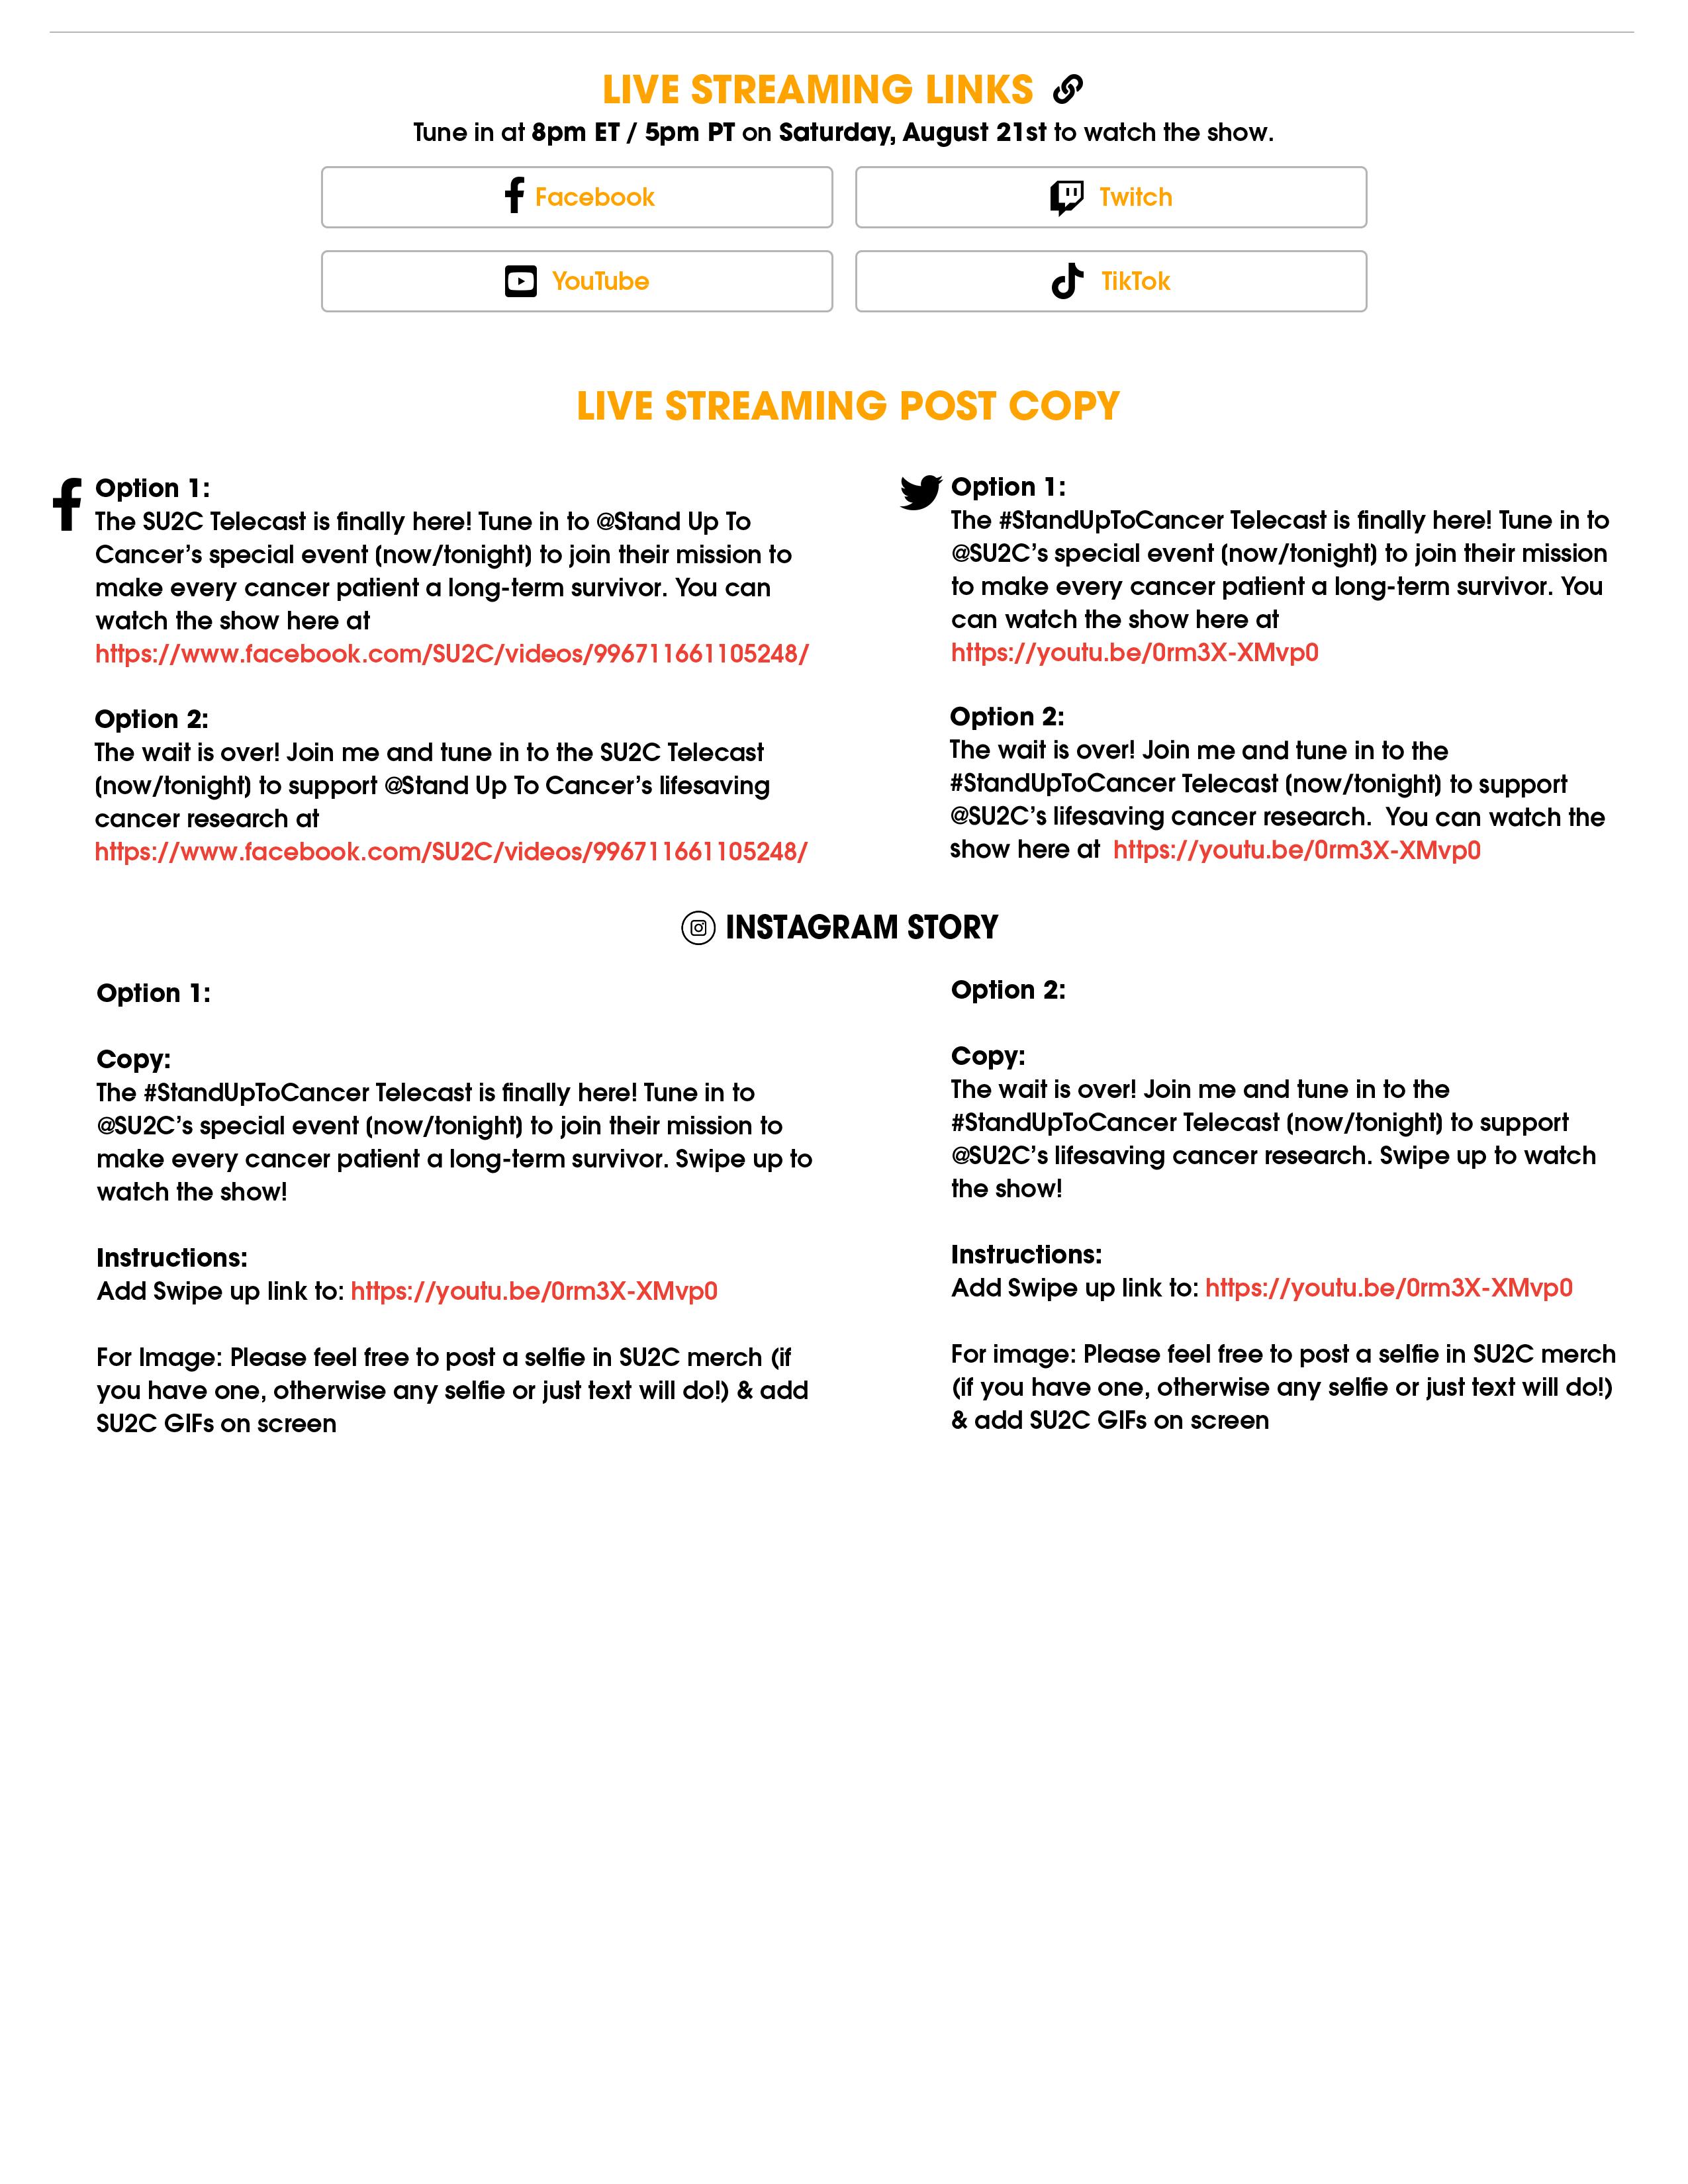 Download the SU2C Telecast Toolkit